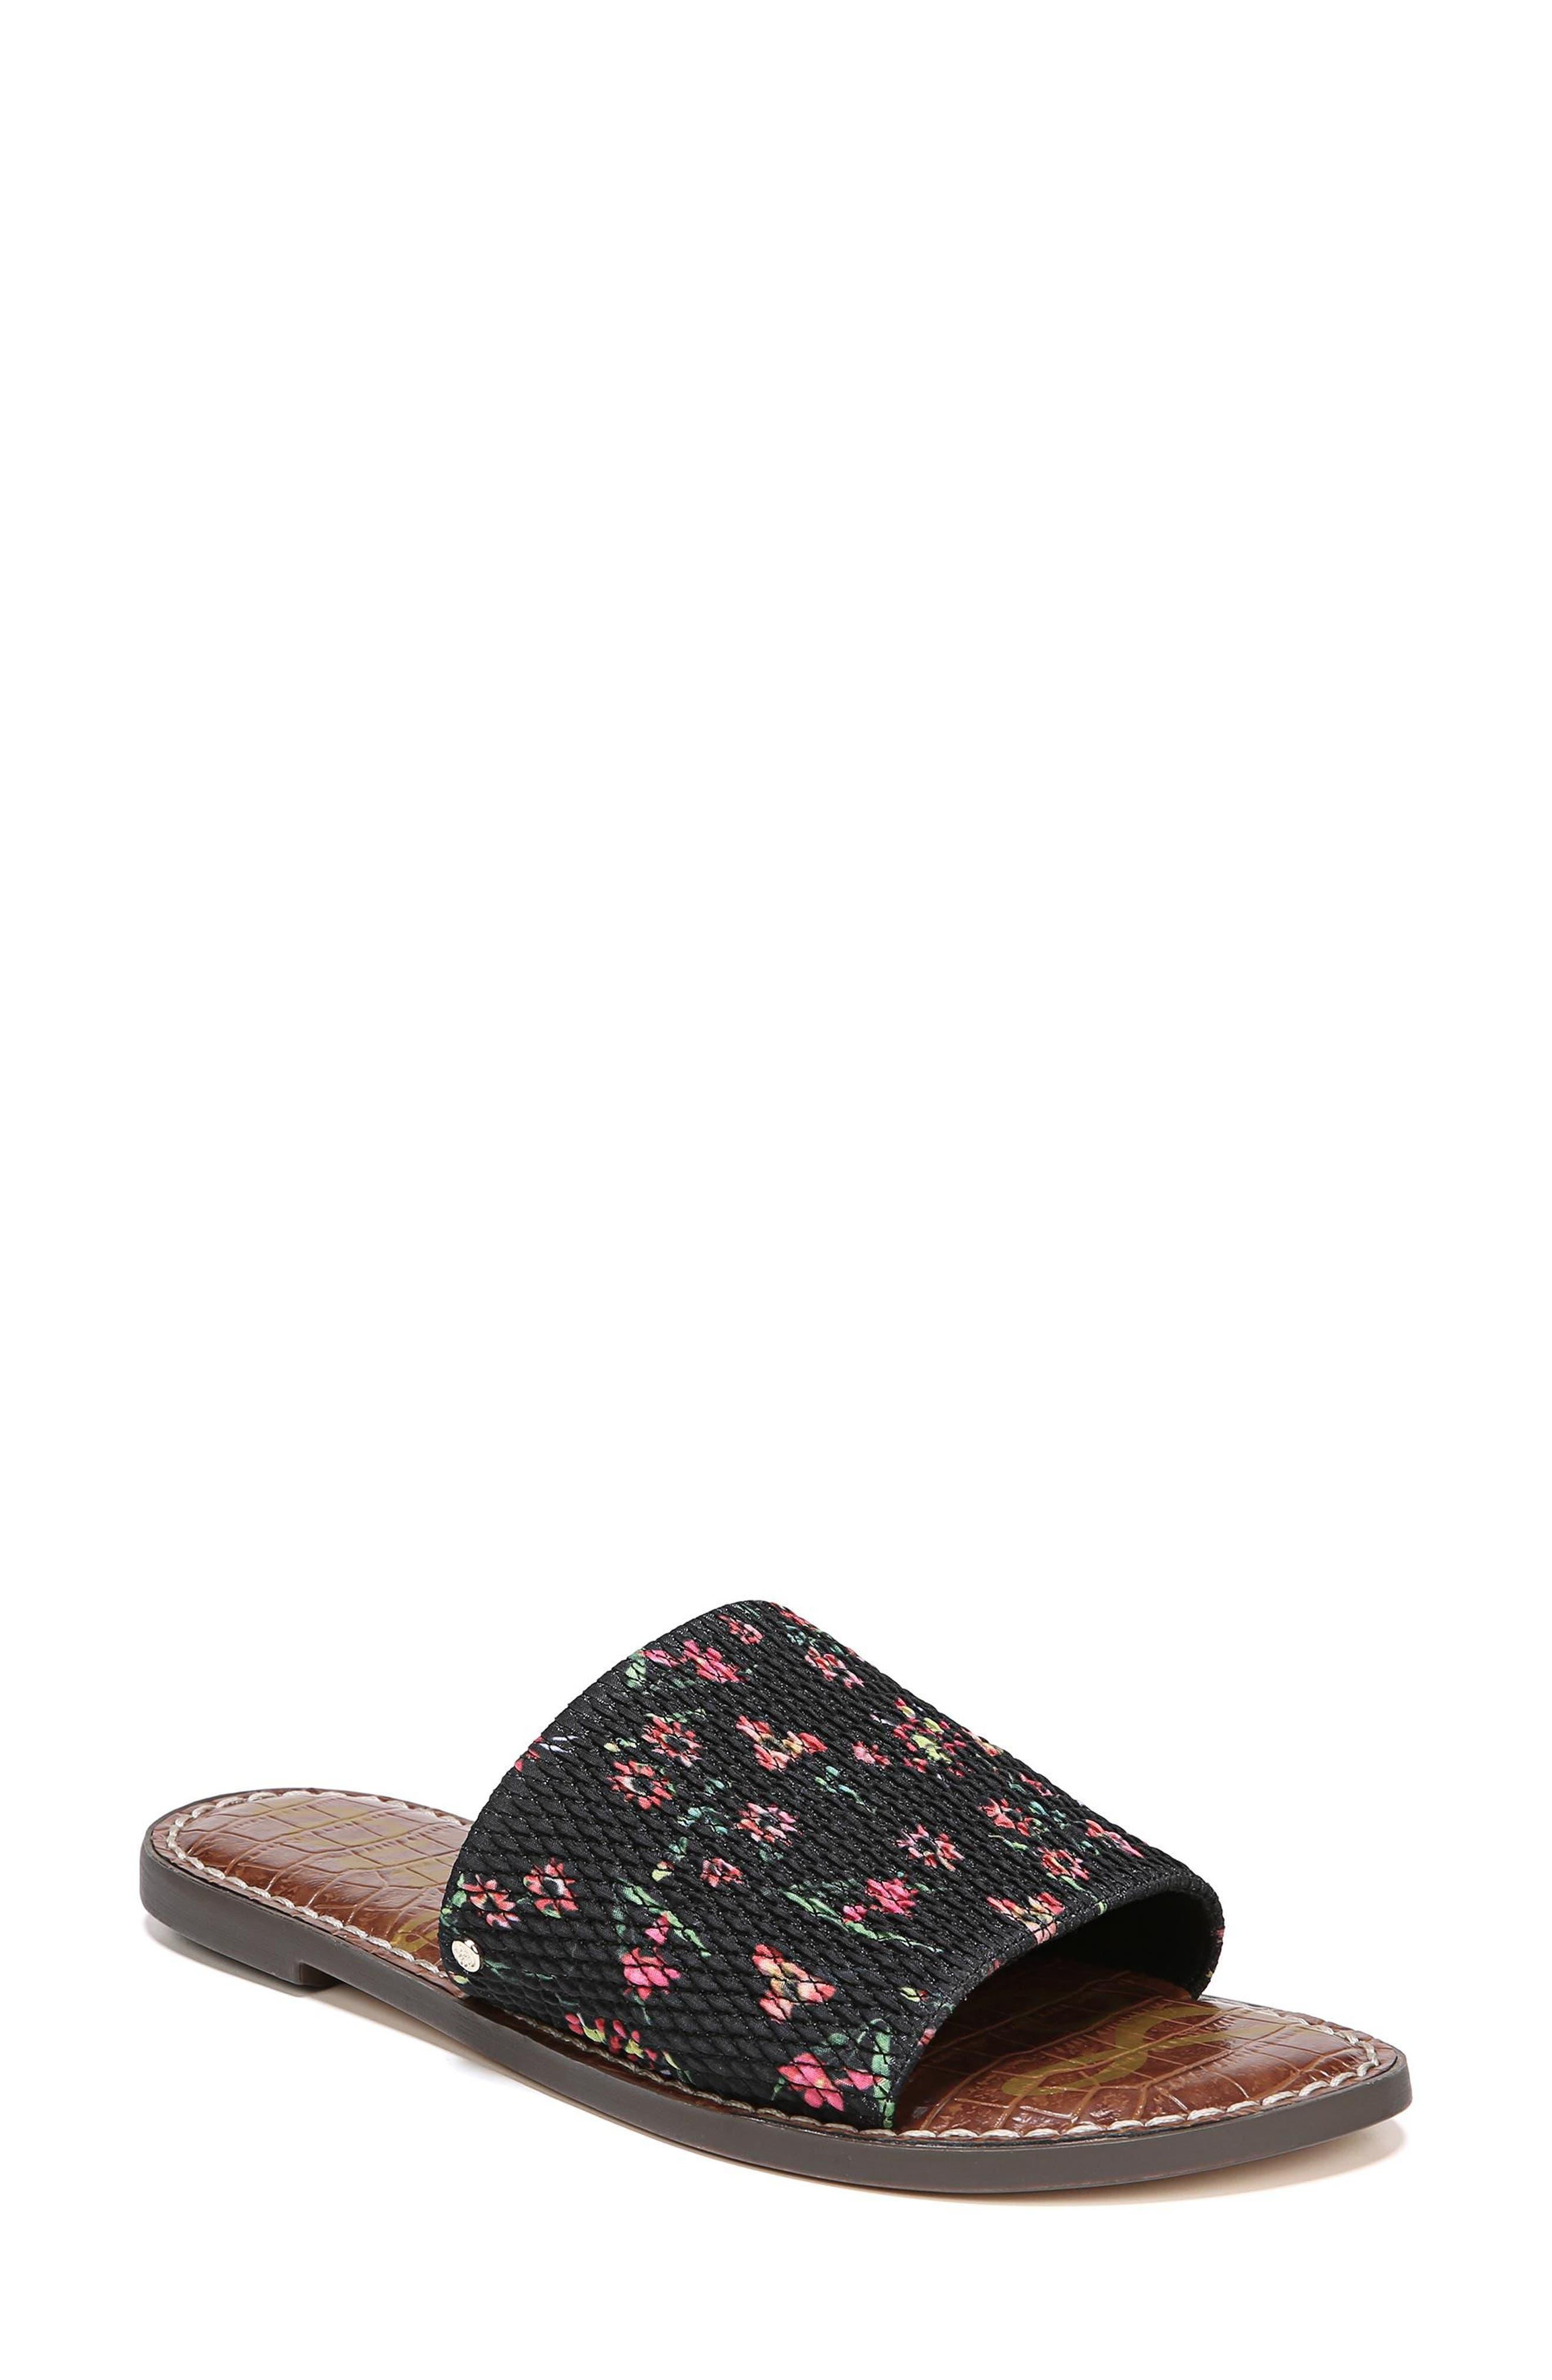 Gio Slide Sandal,                             Main thumbnail 1, color,                             BLACK FLORAL PRINT FABRIC